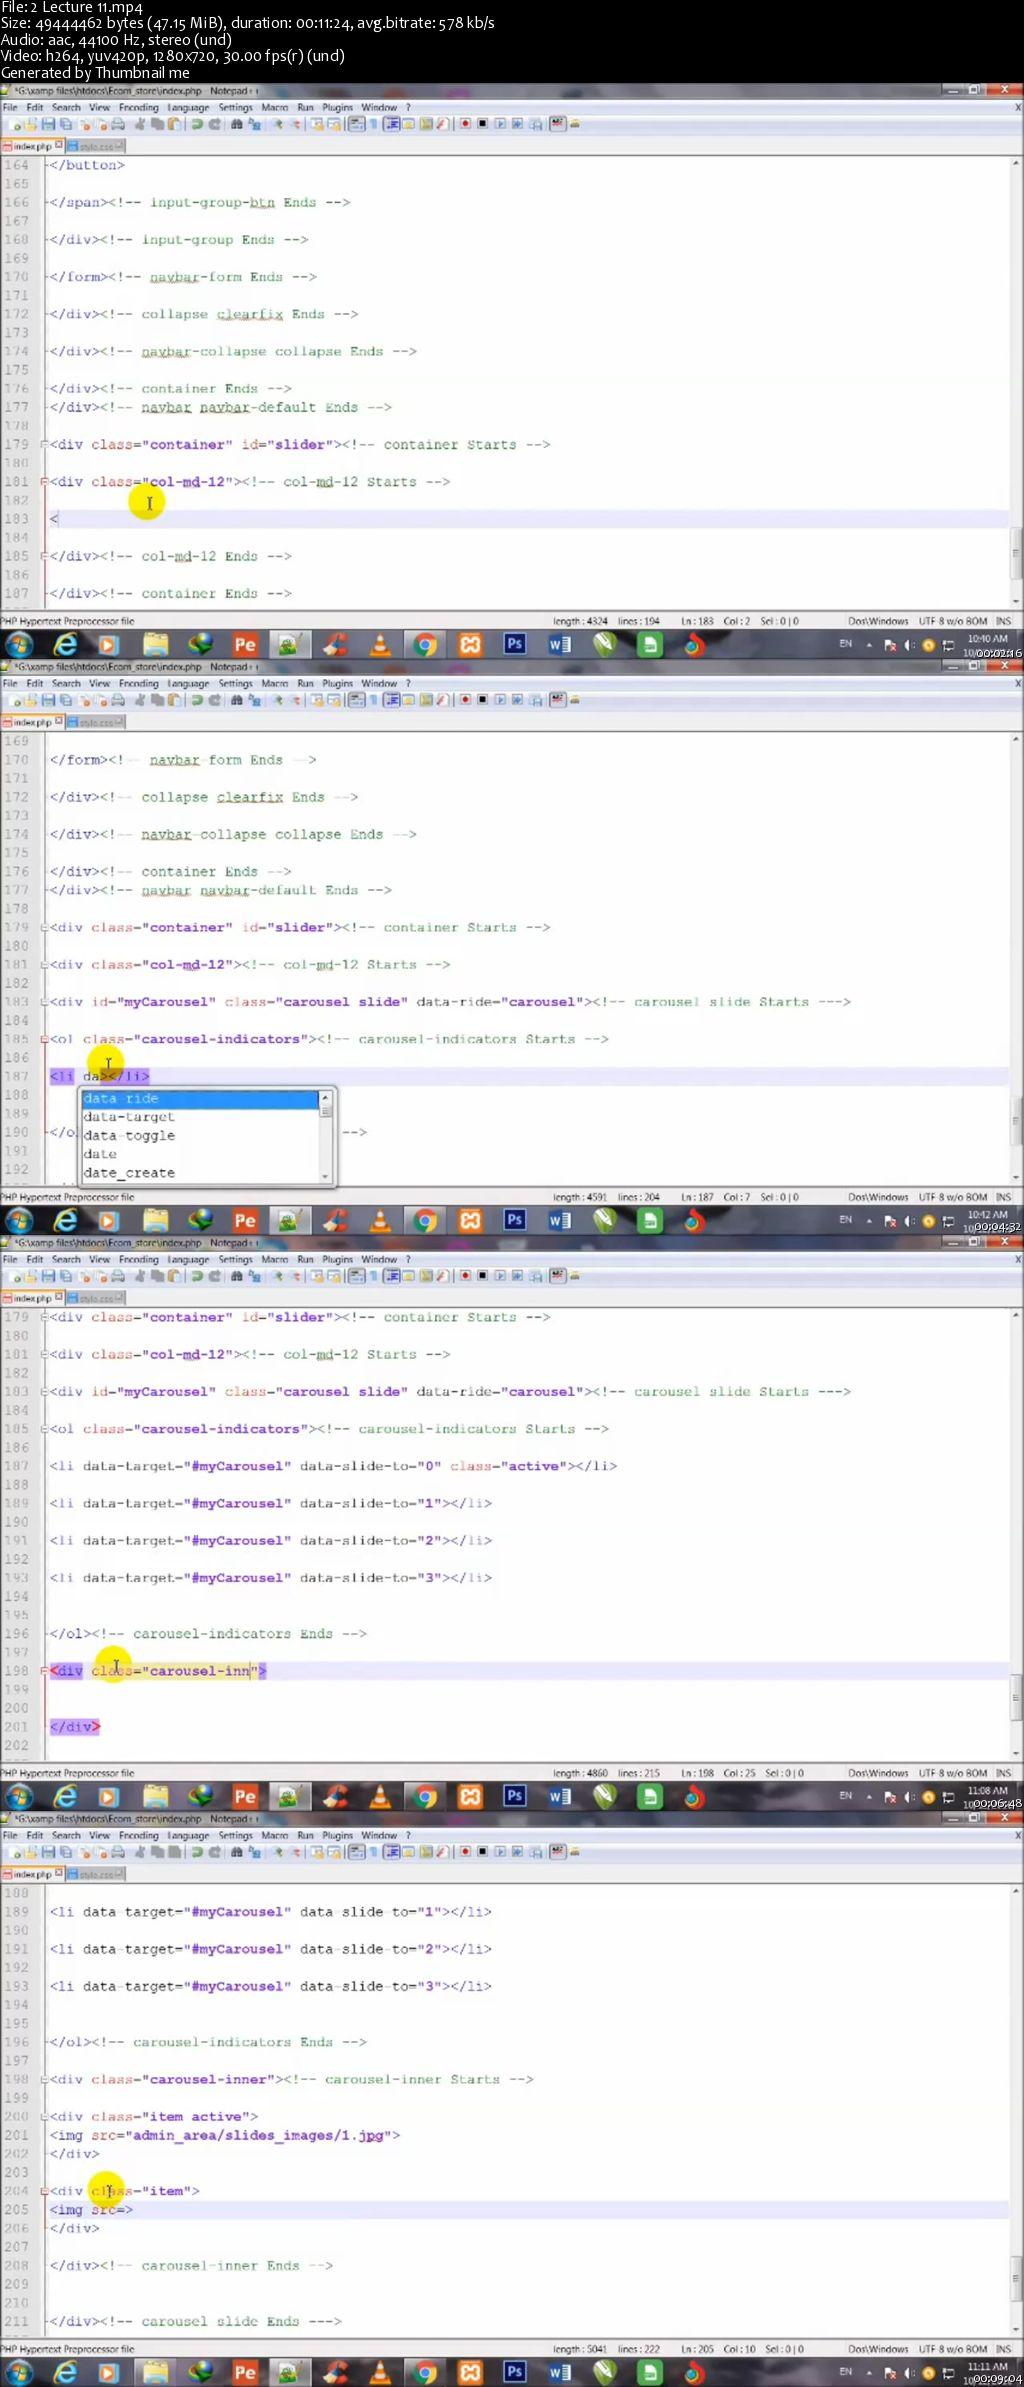 Download Macros & VBA Excel (2016) - SoftArchive